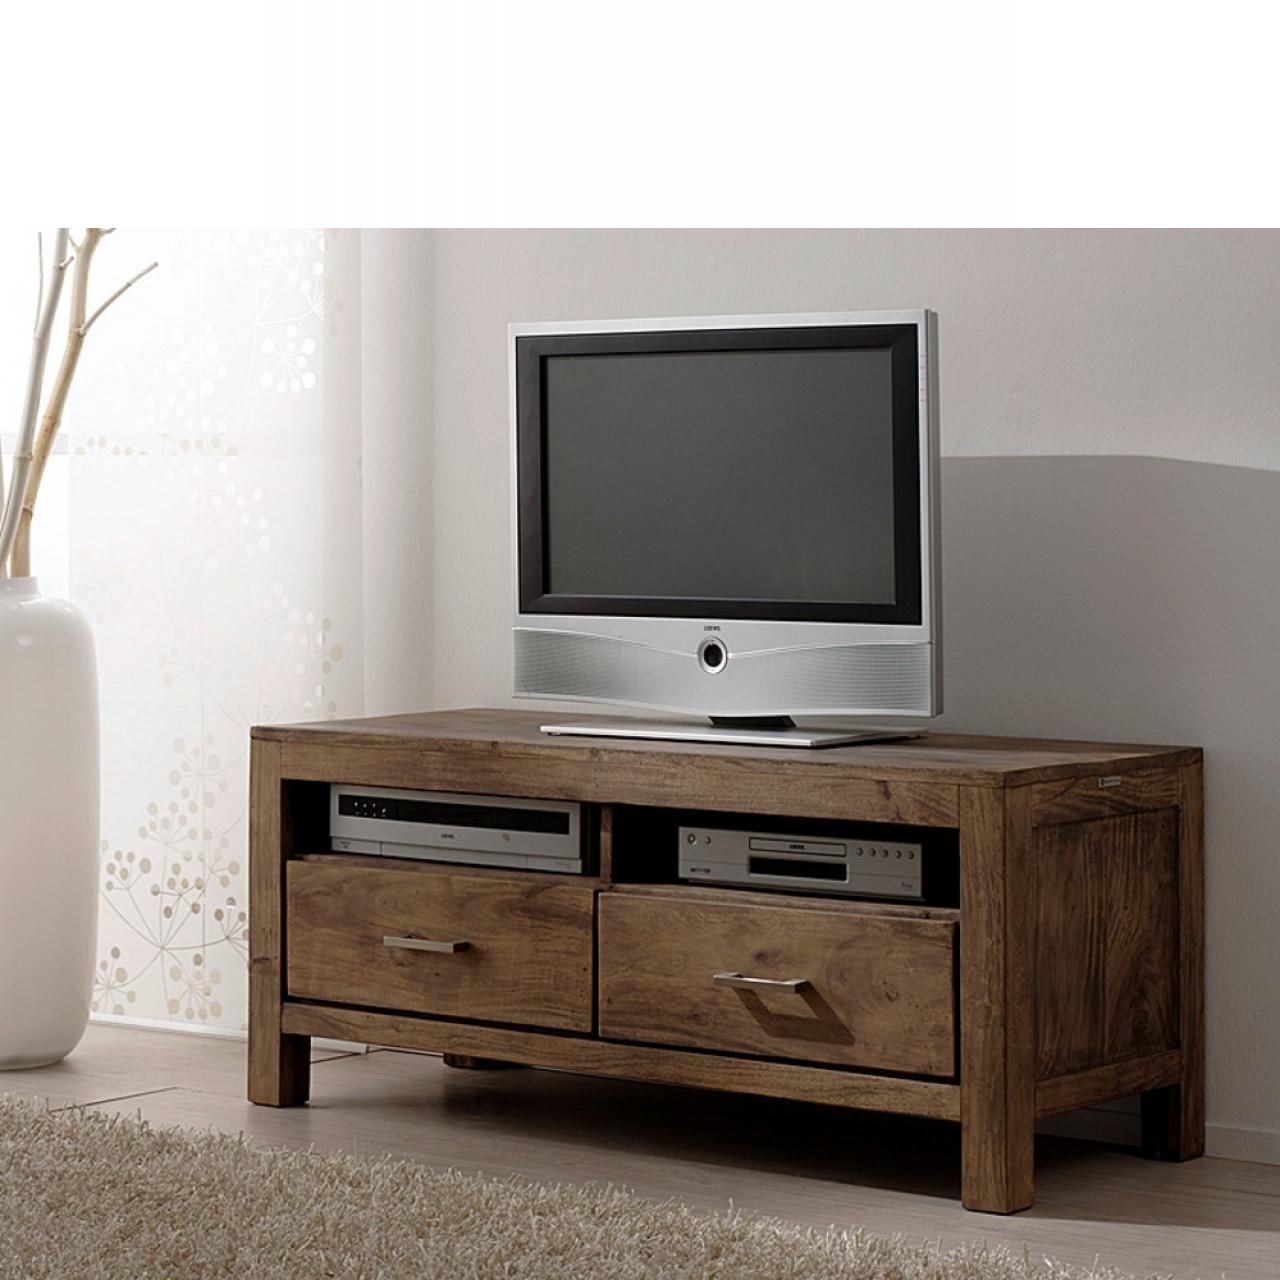 TV-Lowboard - Guru - Forest